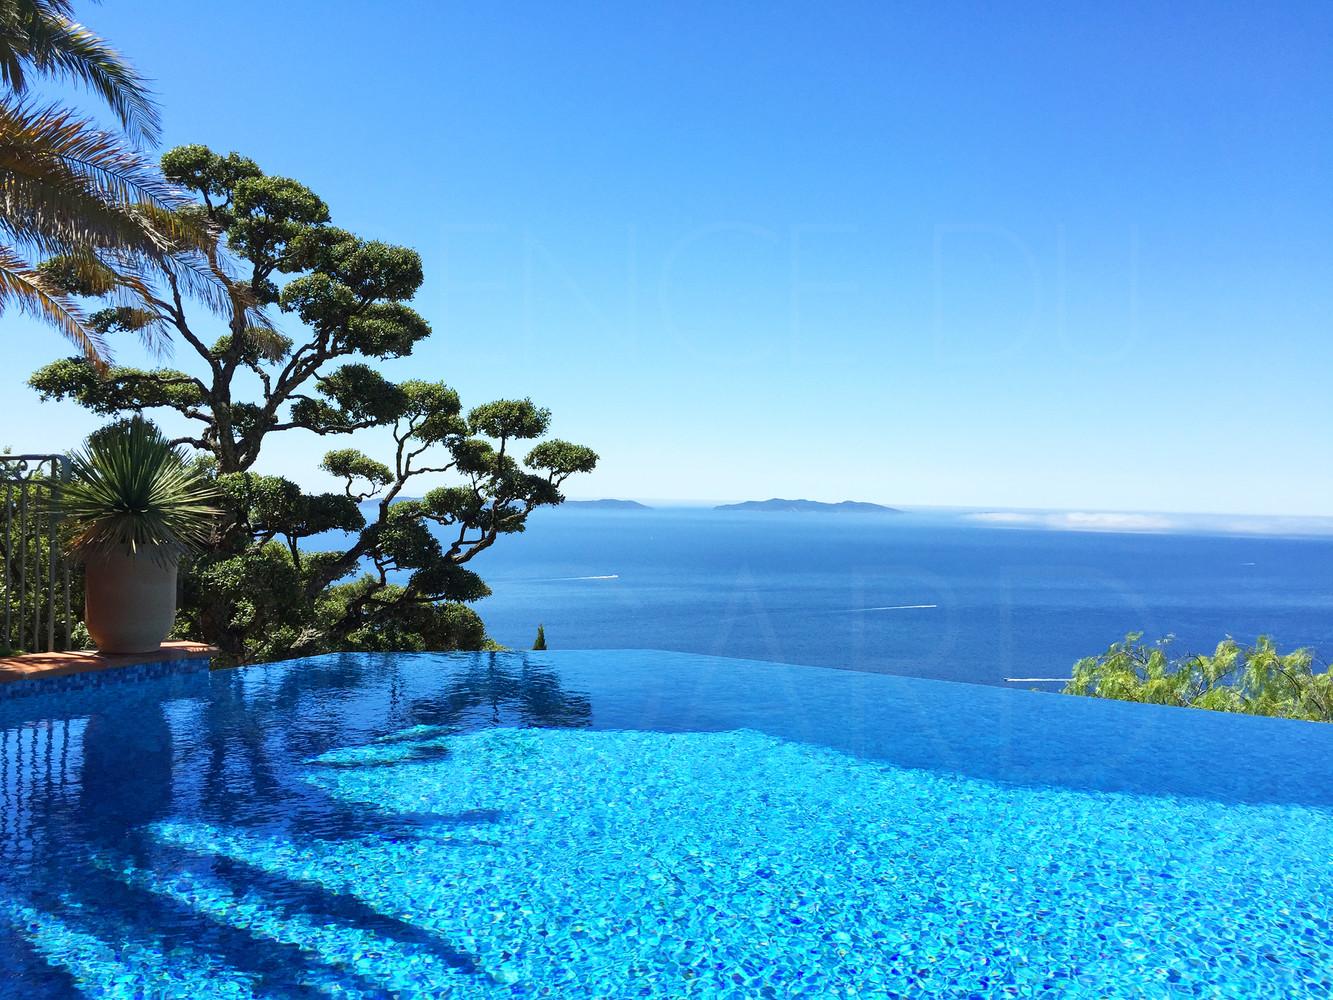 Villa de prestige au rayol canadel propri t avec 5 for Camping saint tropez avec piscine